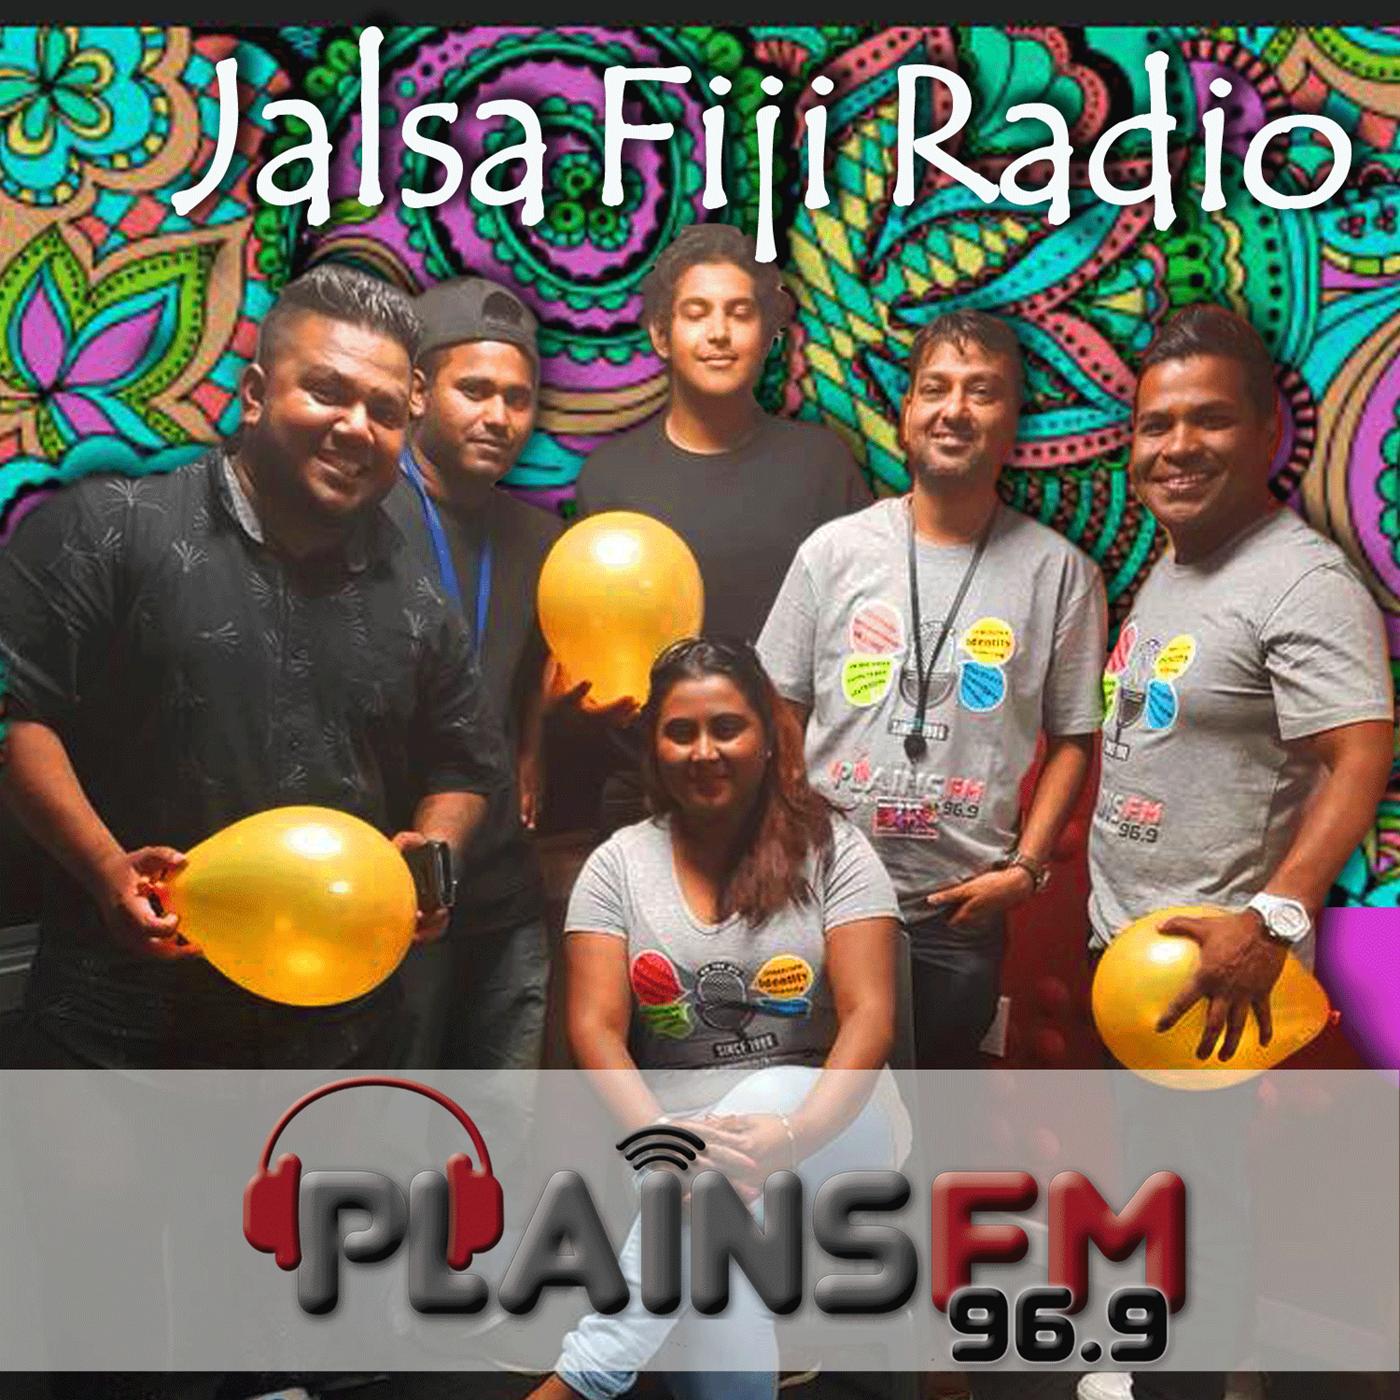 https://cdn.accessradio.org/StationFolder/plainsfm/Images/JalsaFijiRadio.png